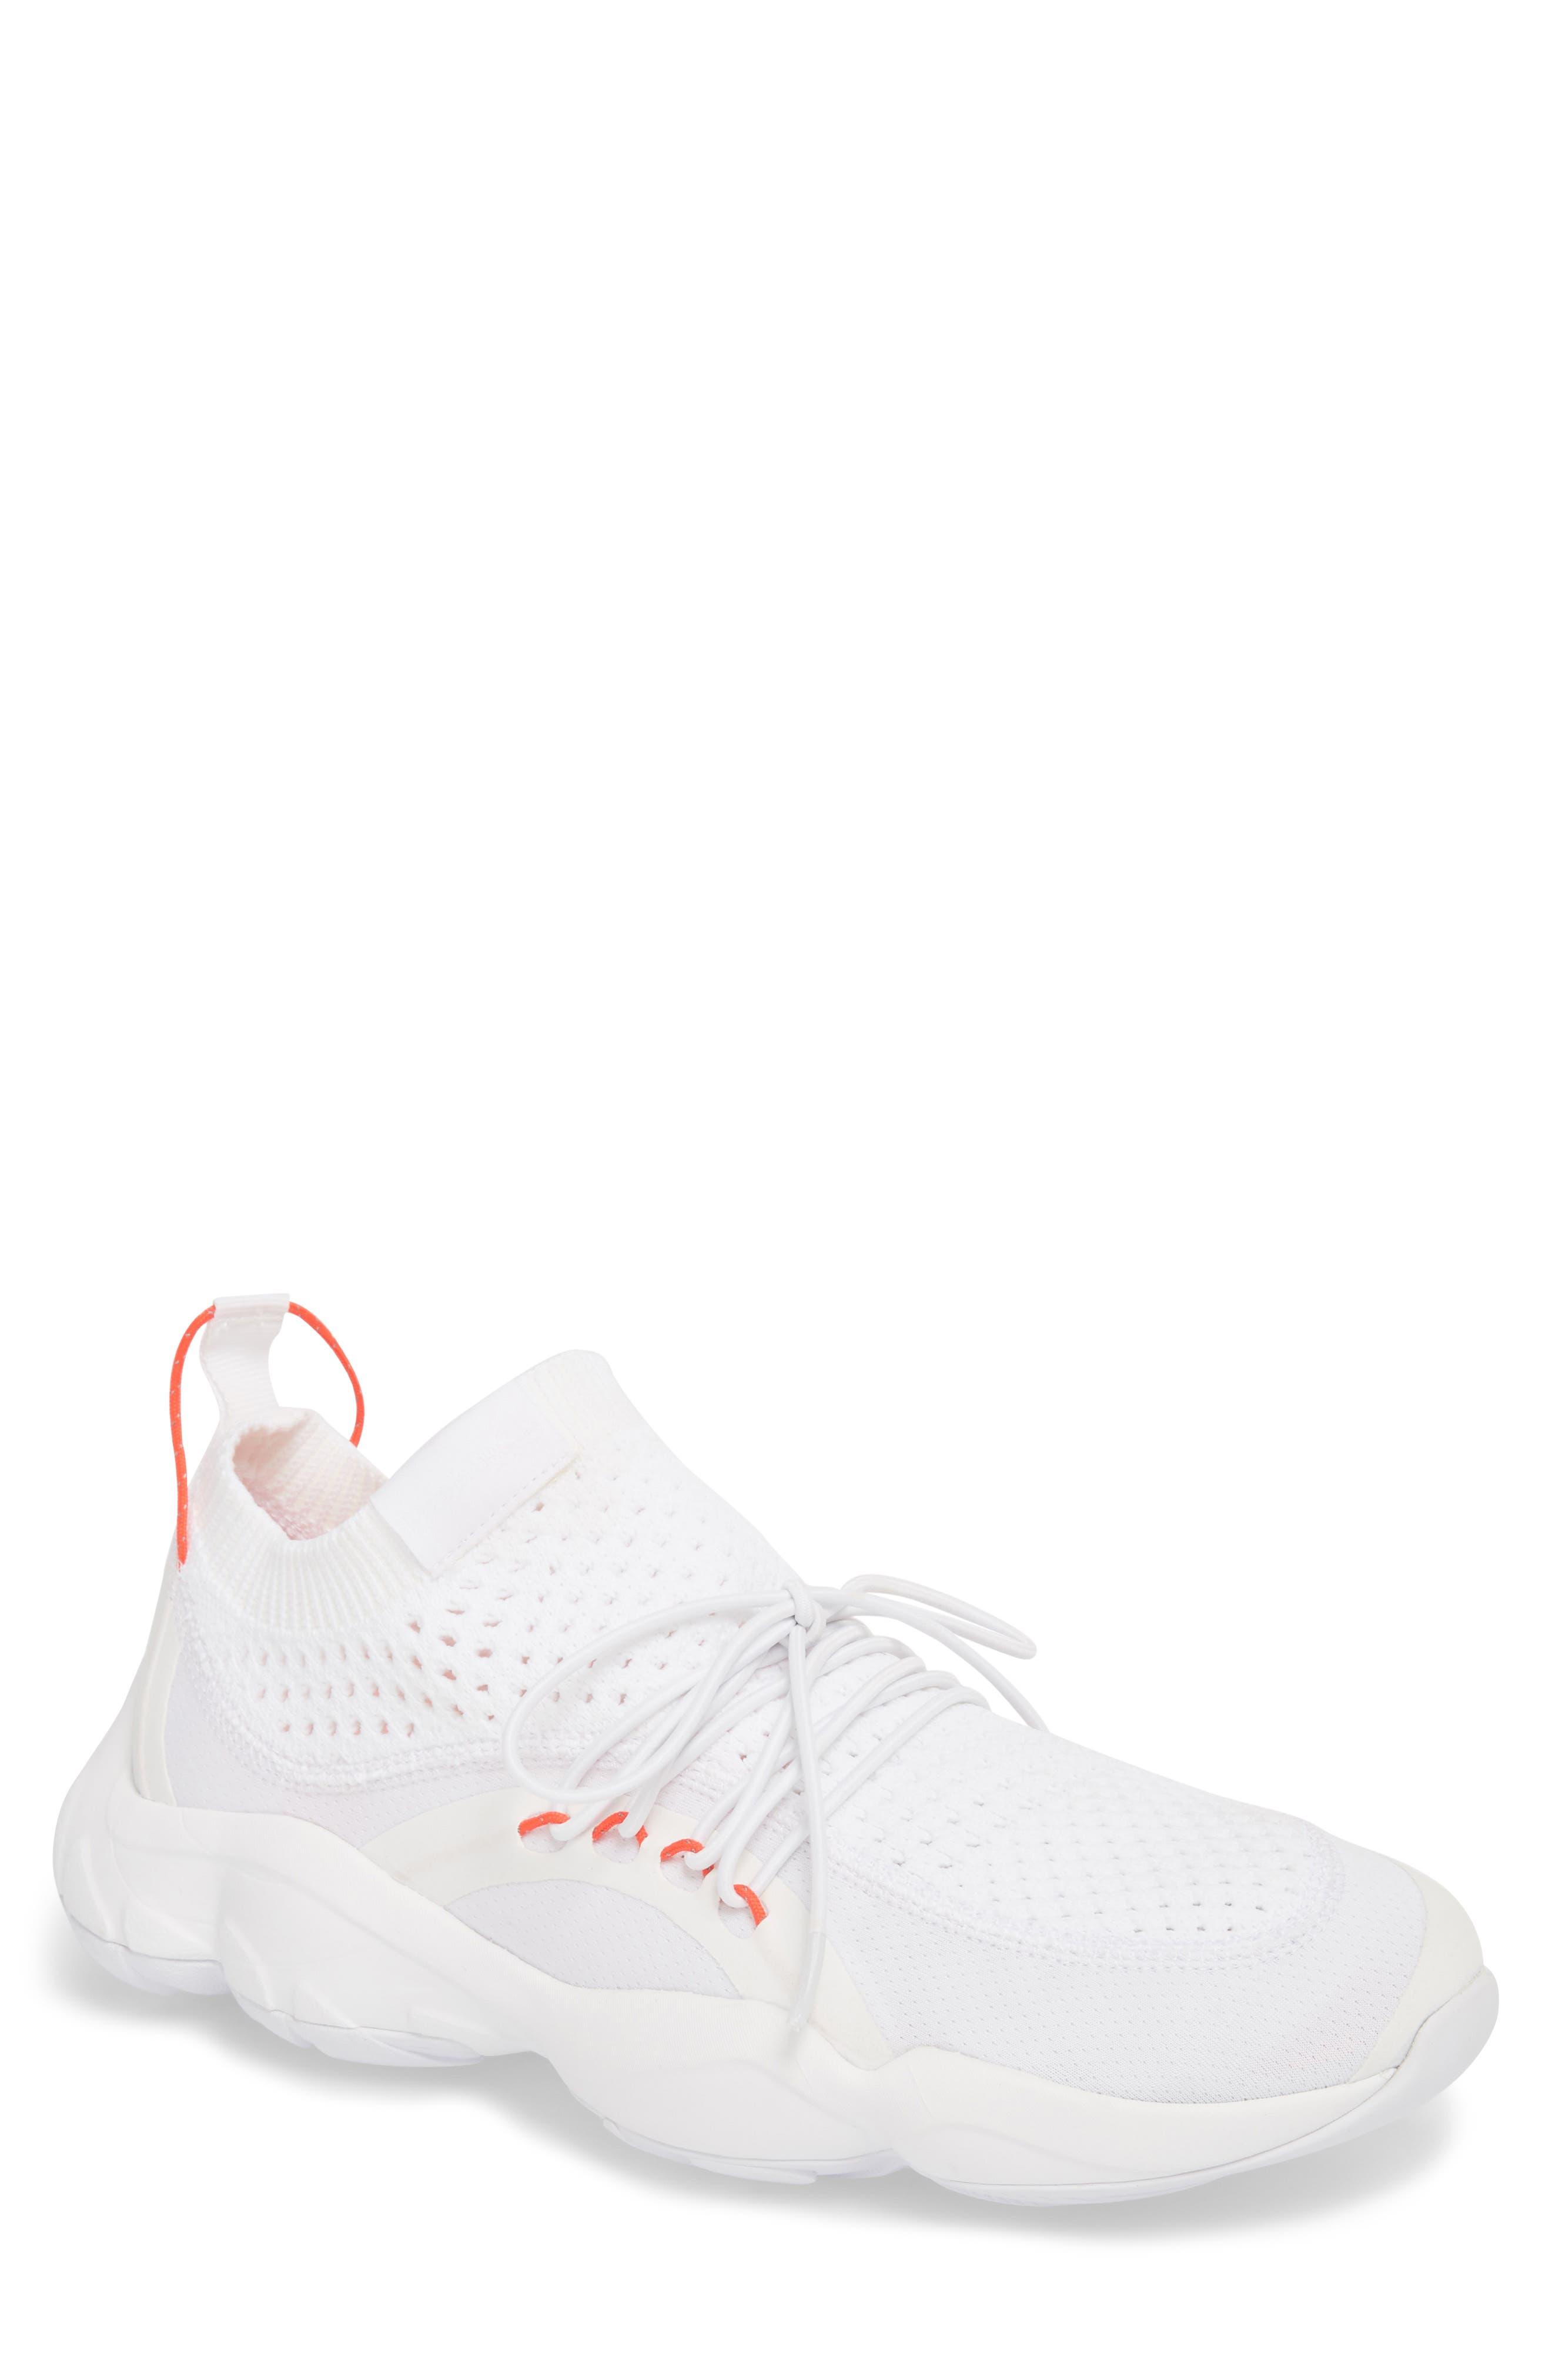 DMX Fusion NR Sneaker,                             Main thumbnail 1, color,                             WHITE/ BLACK/ NEON CHERRY